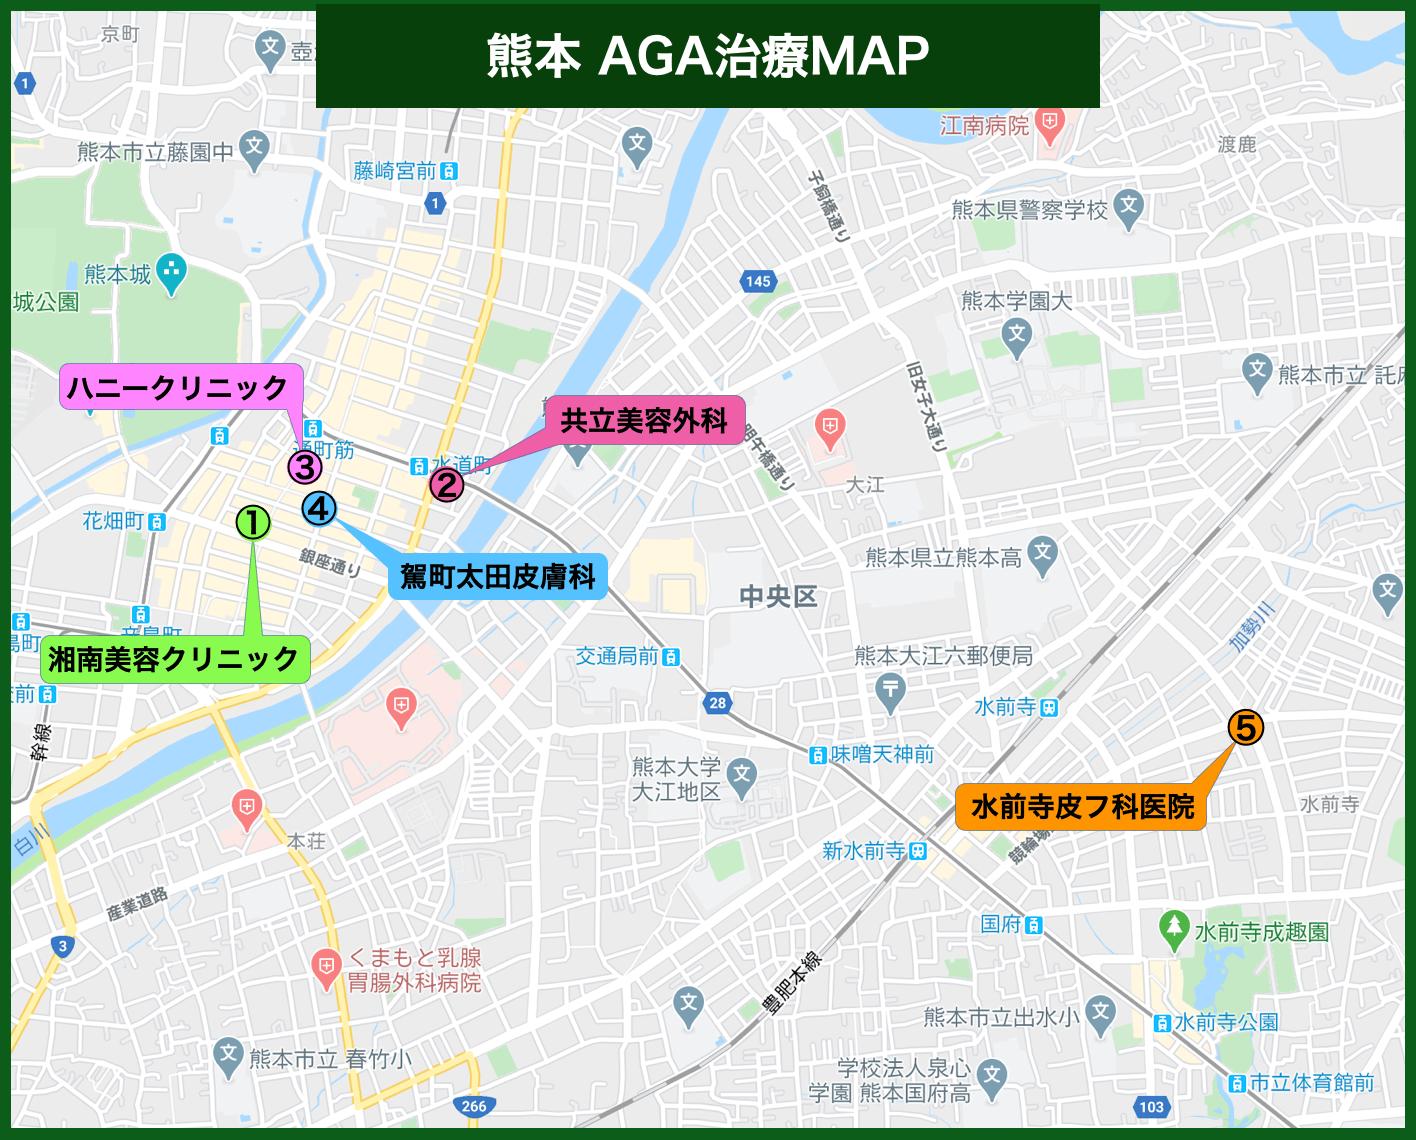 熊本 AGA治療MAP